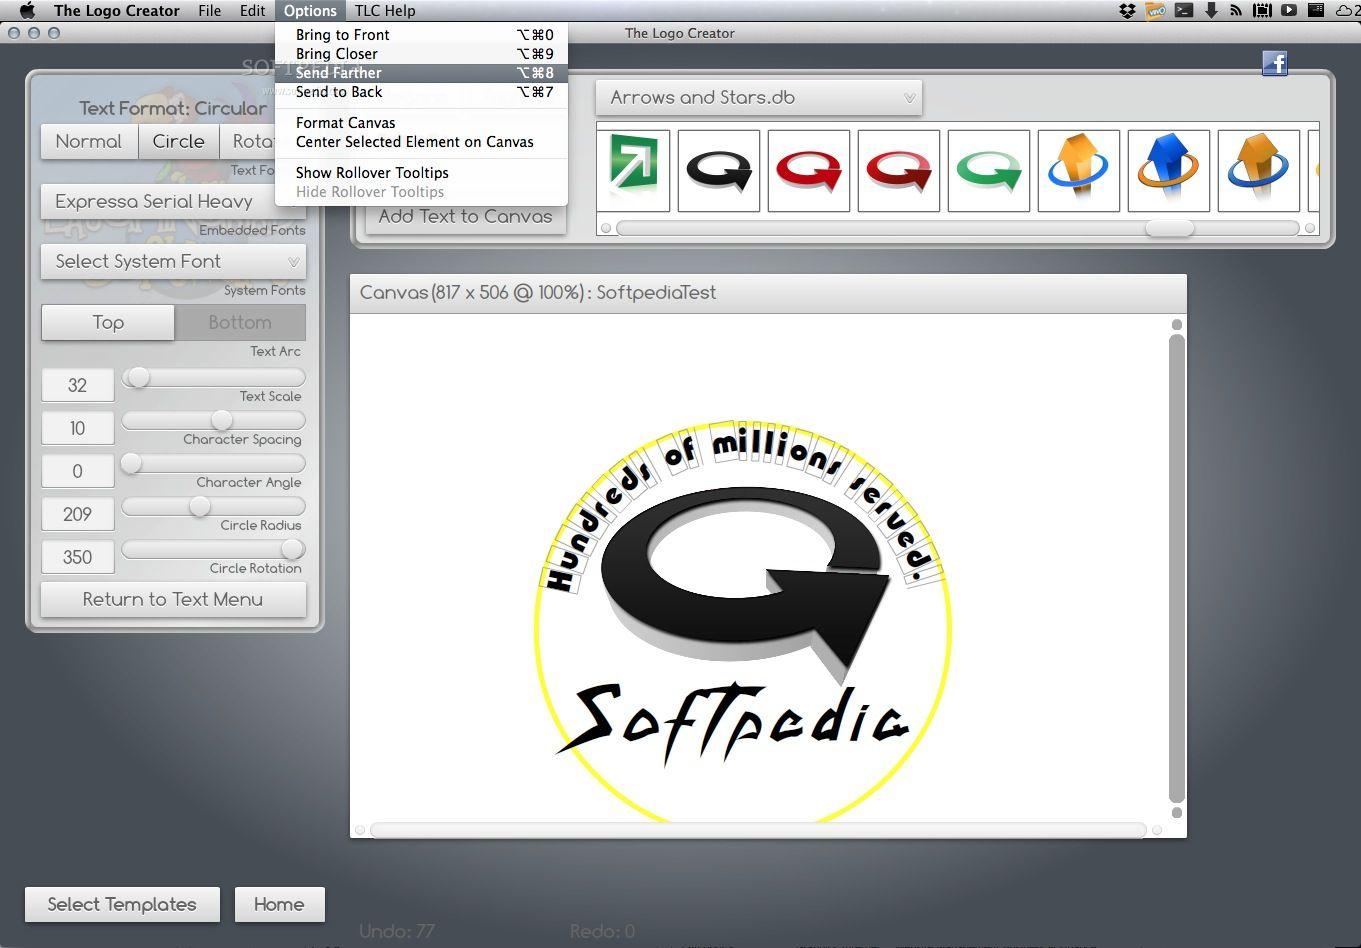 برنامج تصميم شعارات